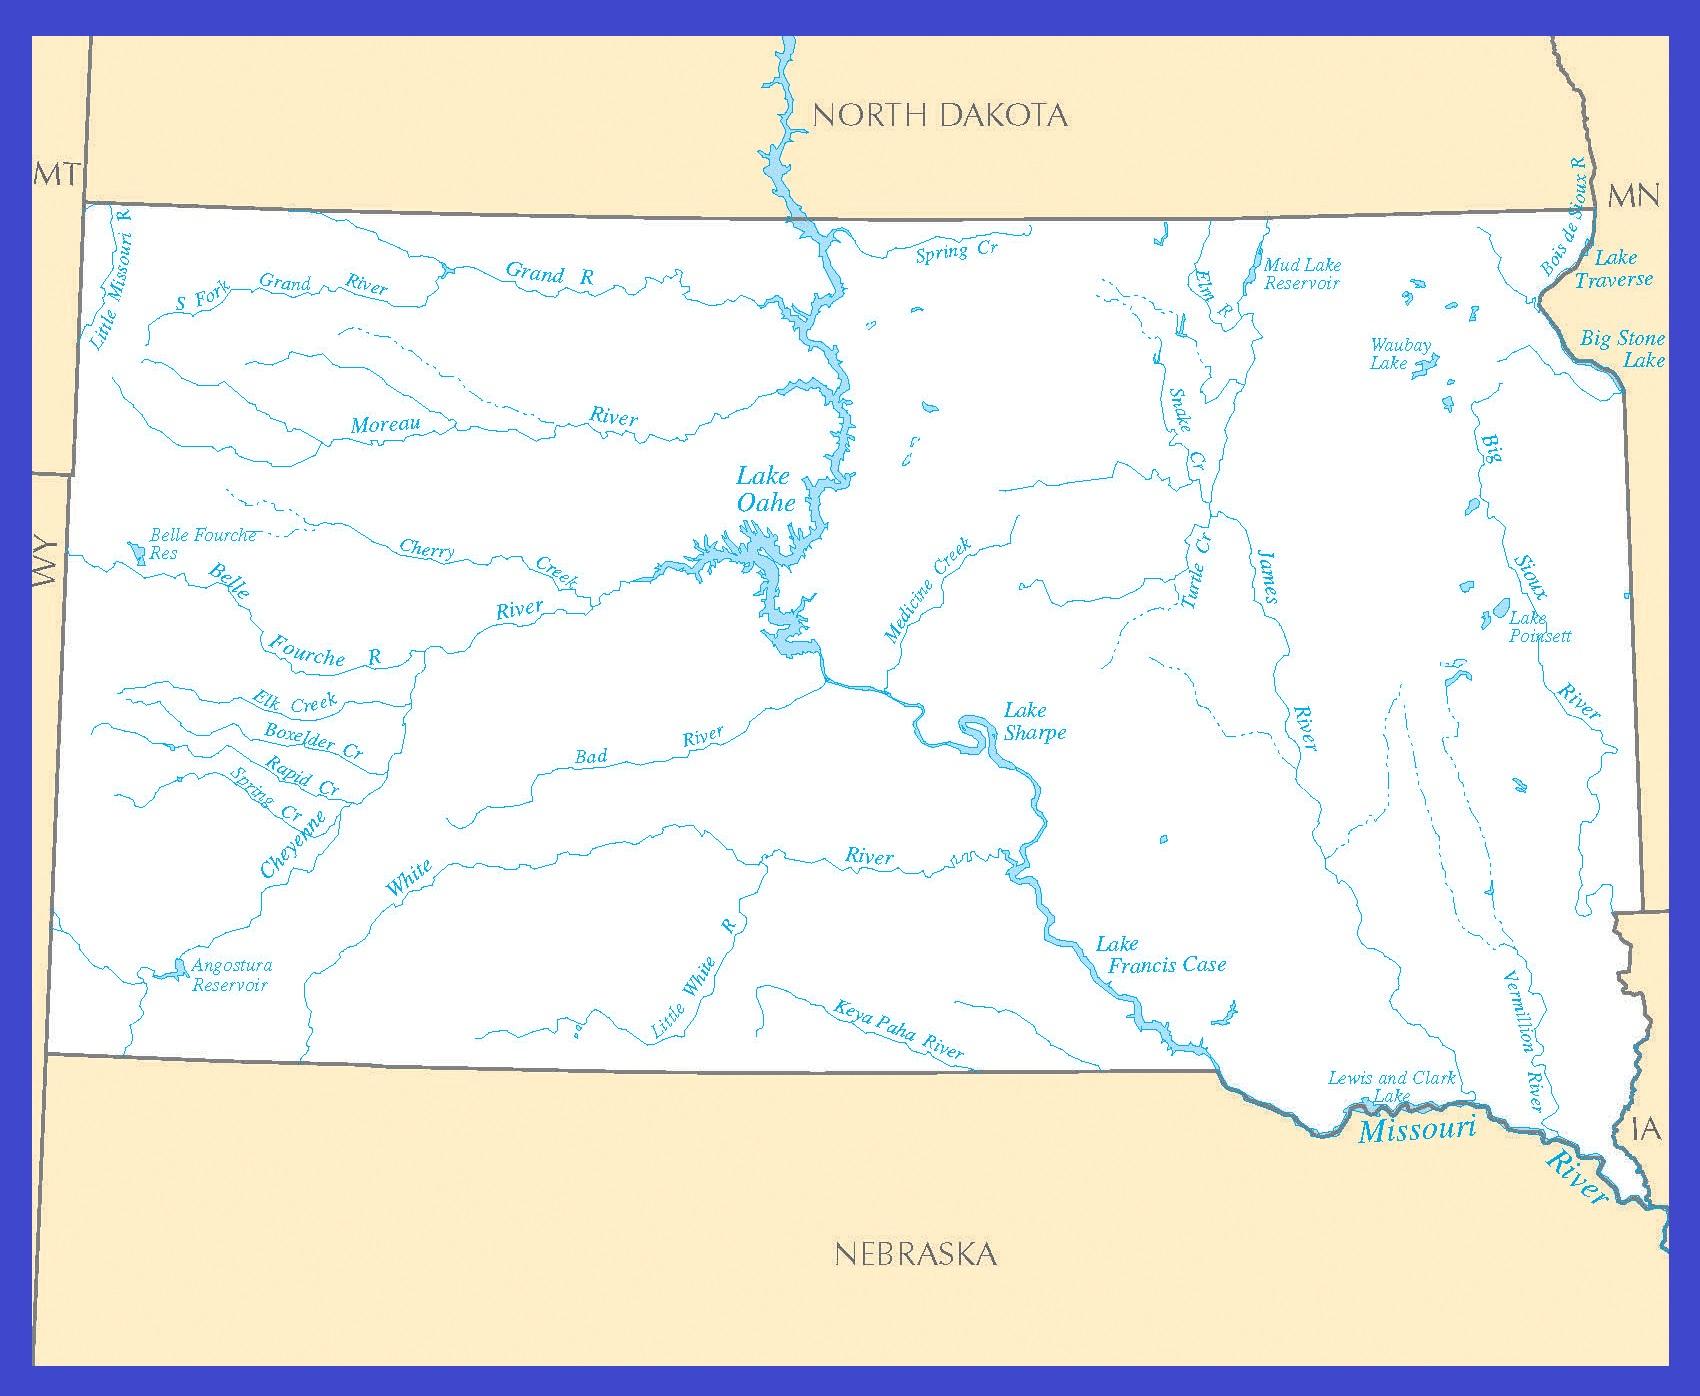 South Dakota Rivers Map | Large Printable High Resolution and Standard Map